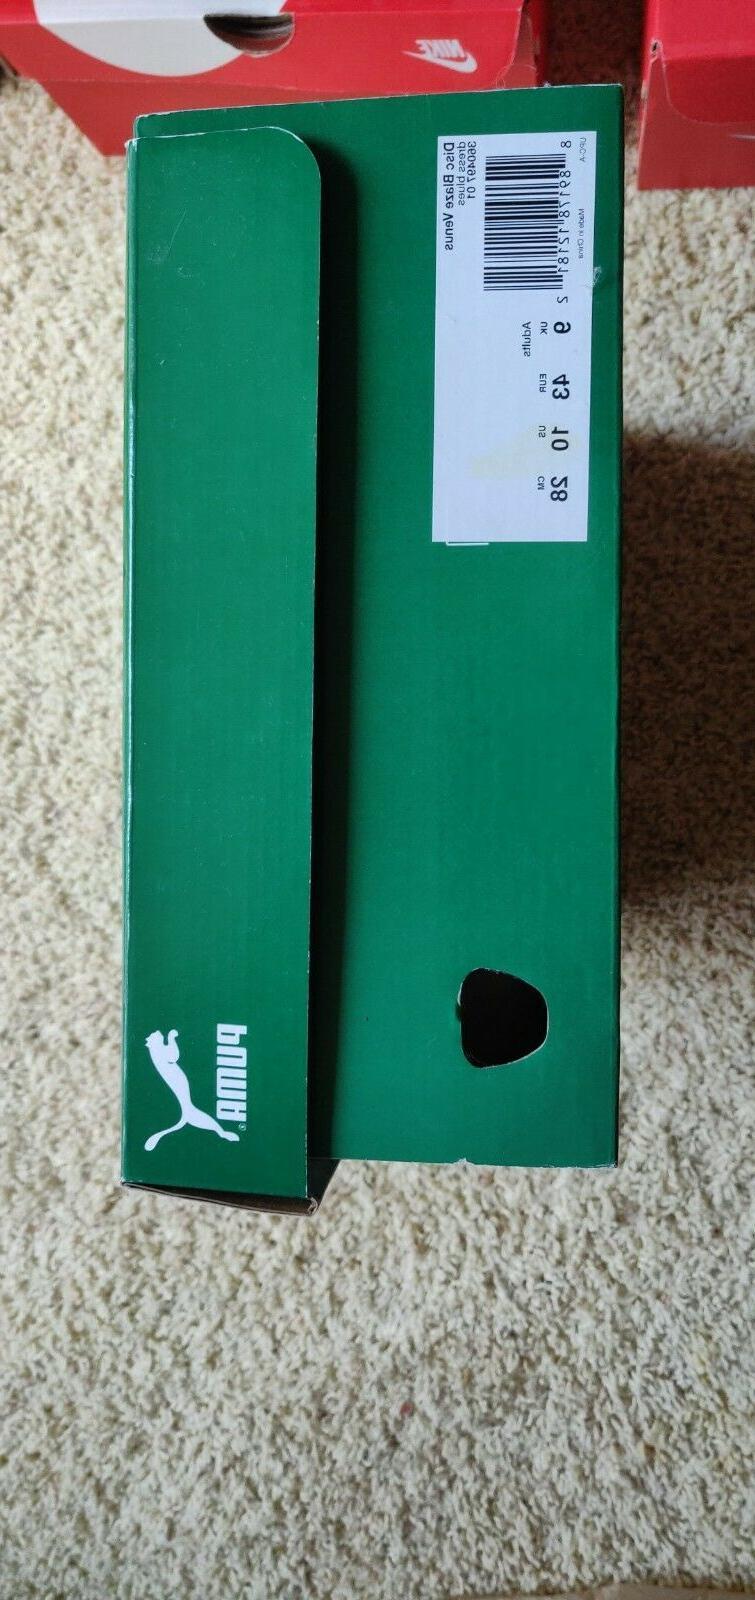 Blaze size box